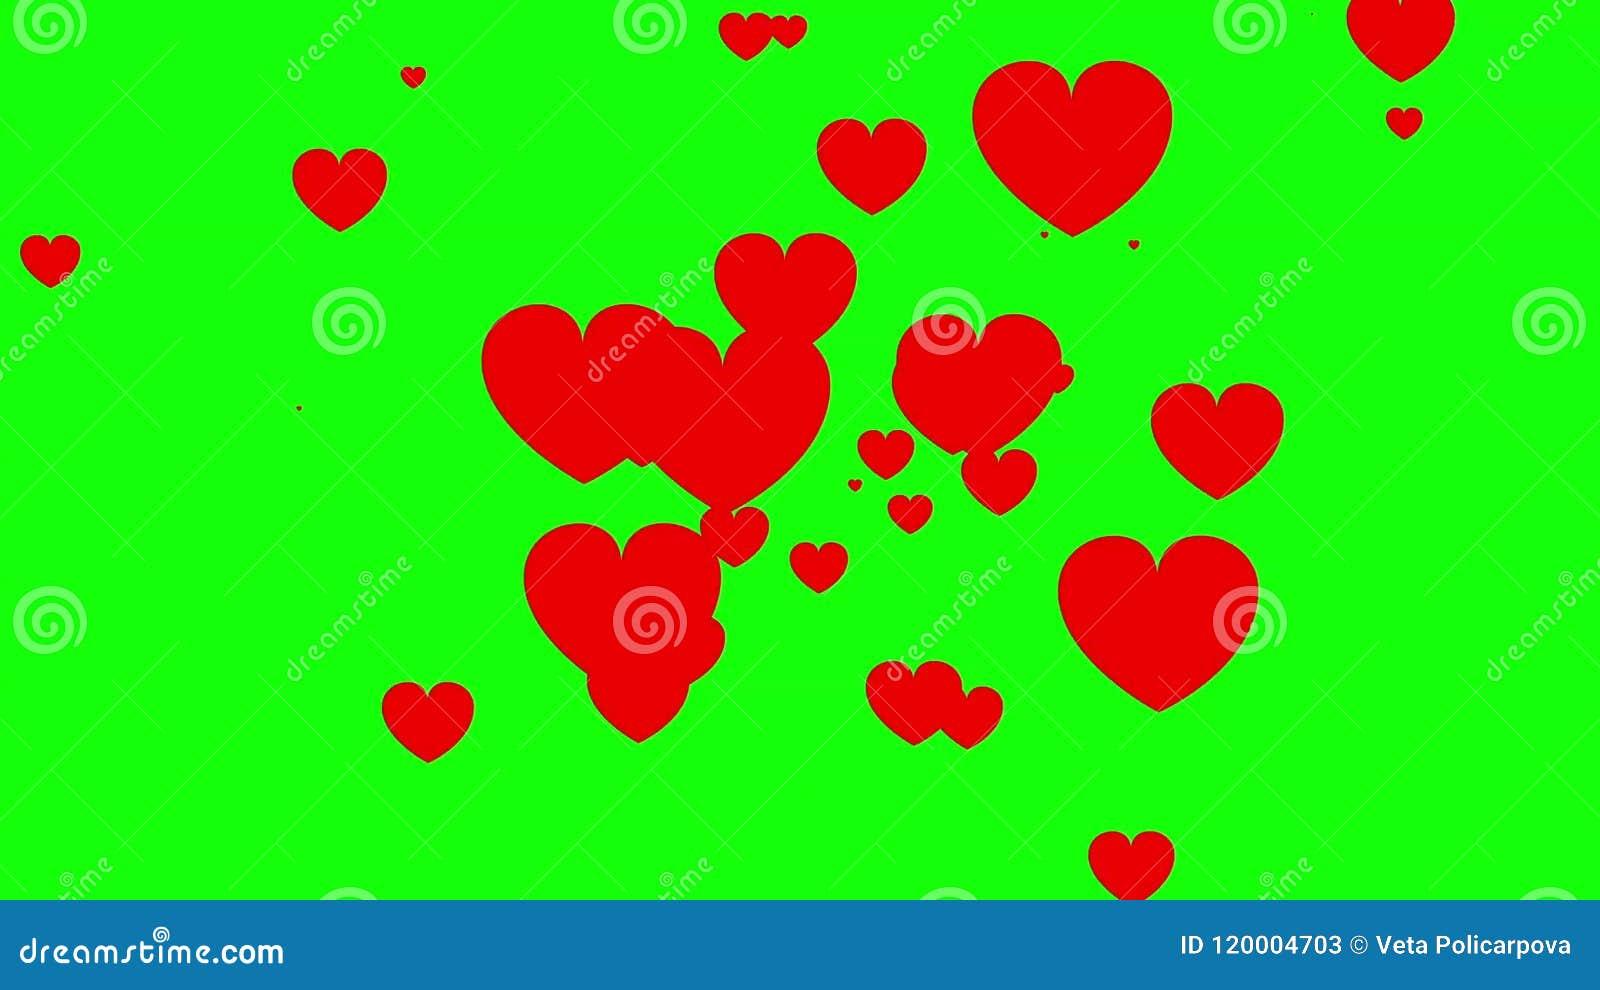 Animated 2d heart  Romantic, wedding